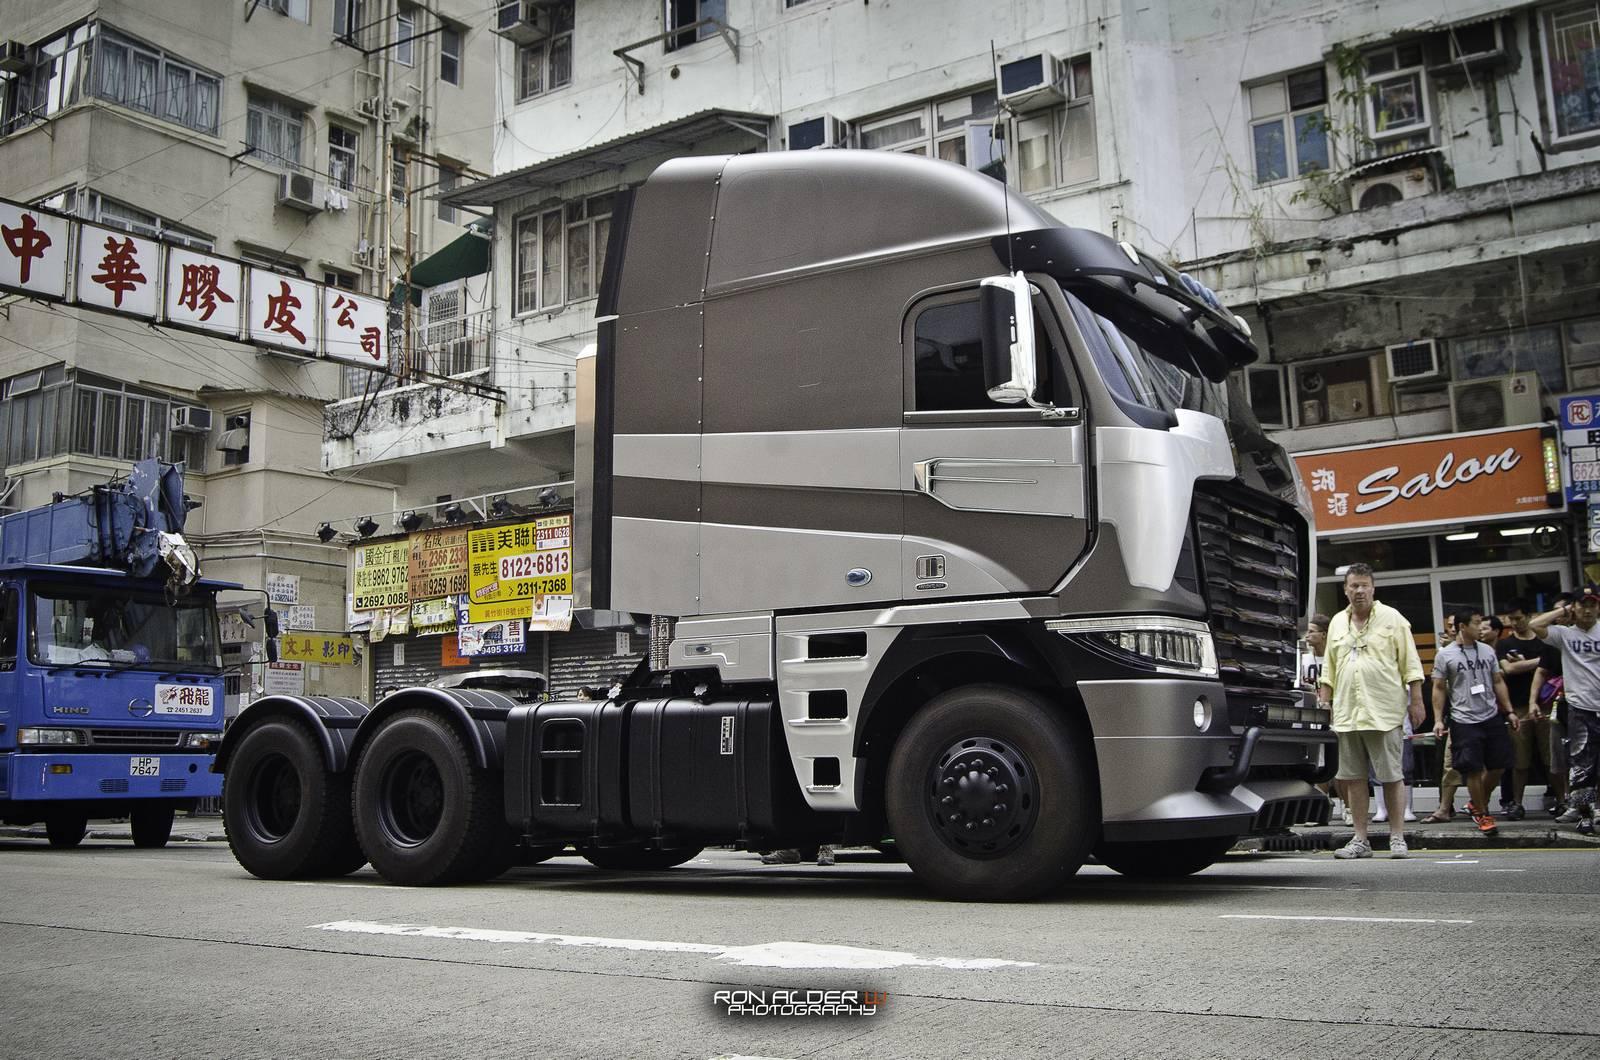 Transformers 4 Hong Kong Filming - 301.5KB